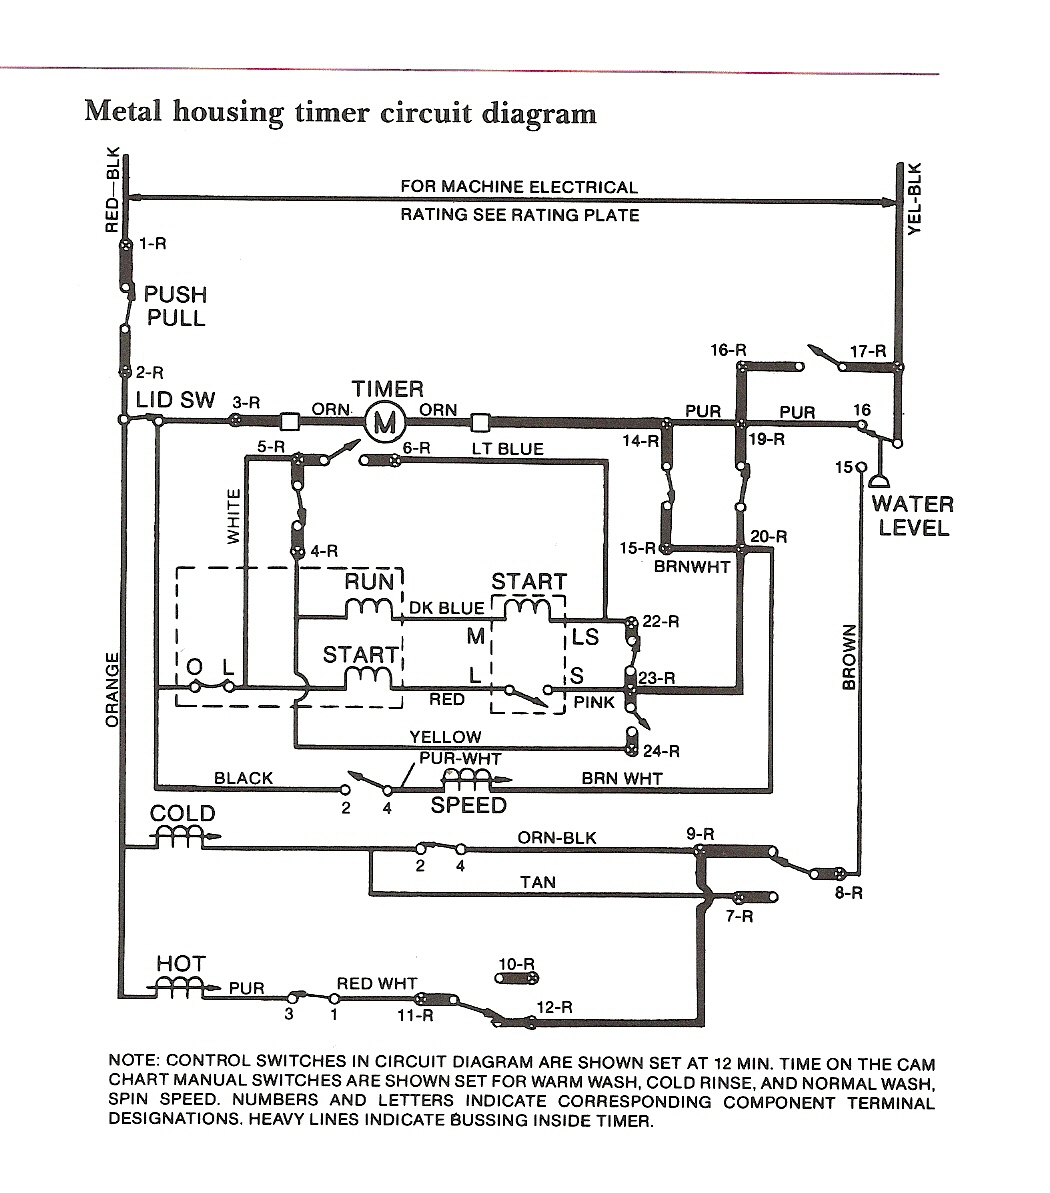 ge washer motor wiring diagram Collection-ge washer wiring diagram explore schematic wiring diagram u2022 rh webwiringdiagram today 3-t